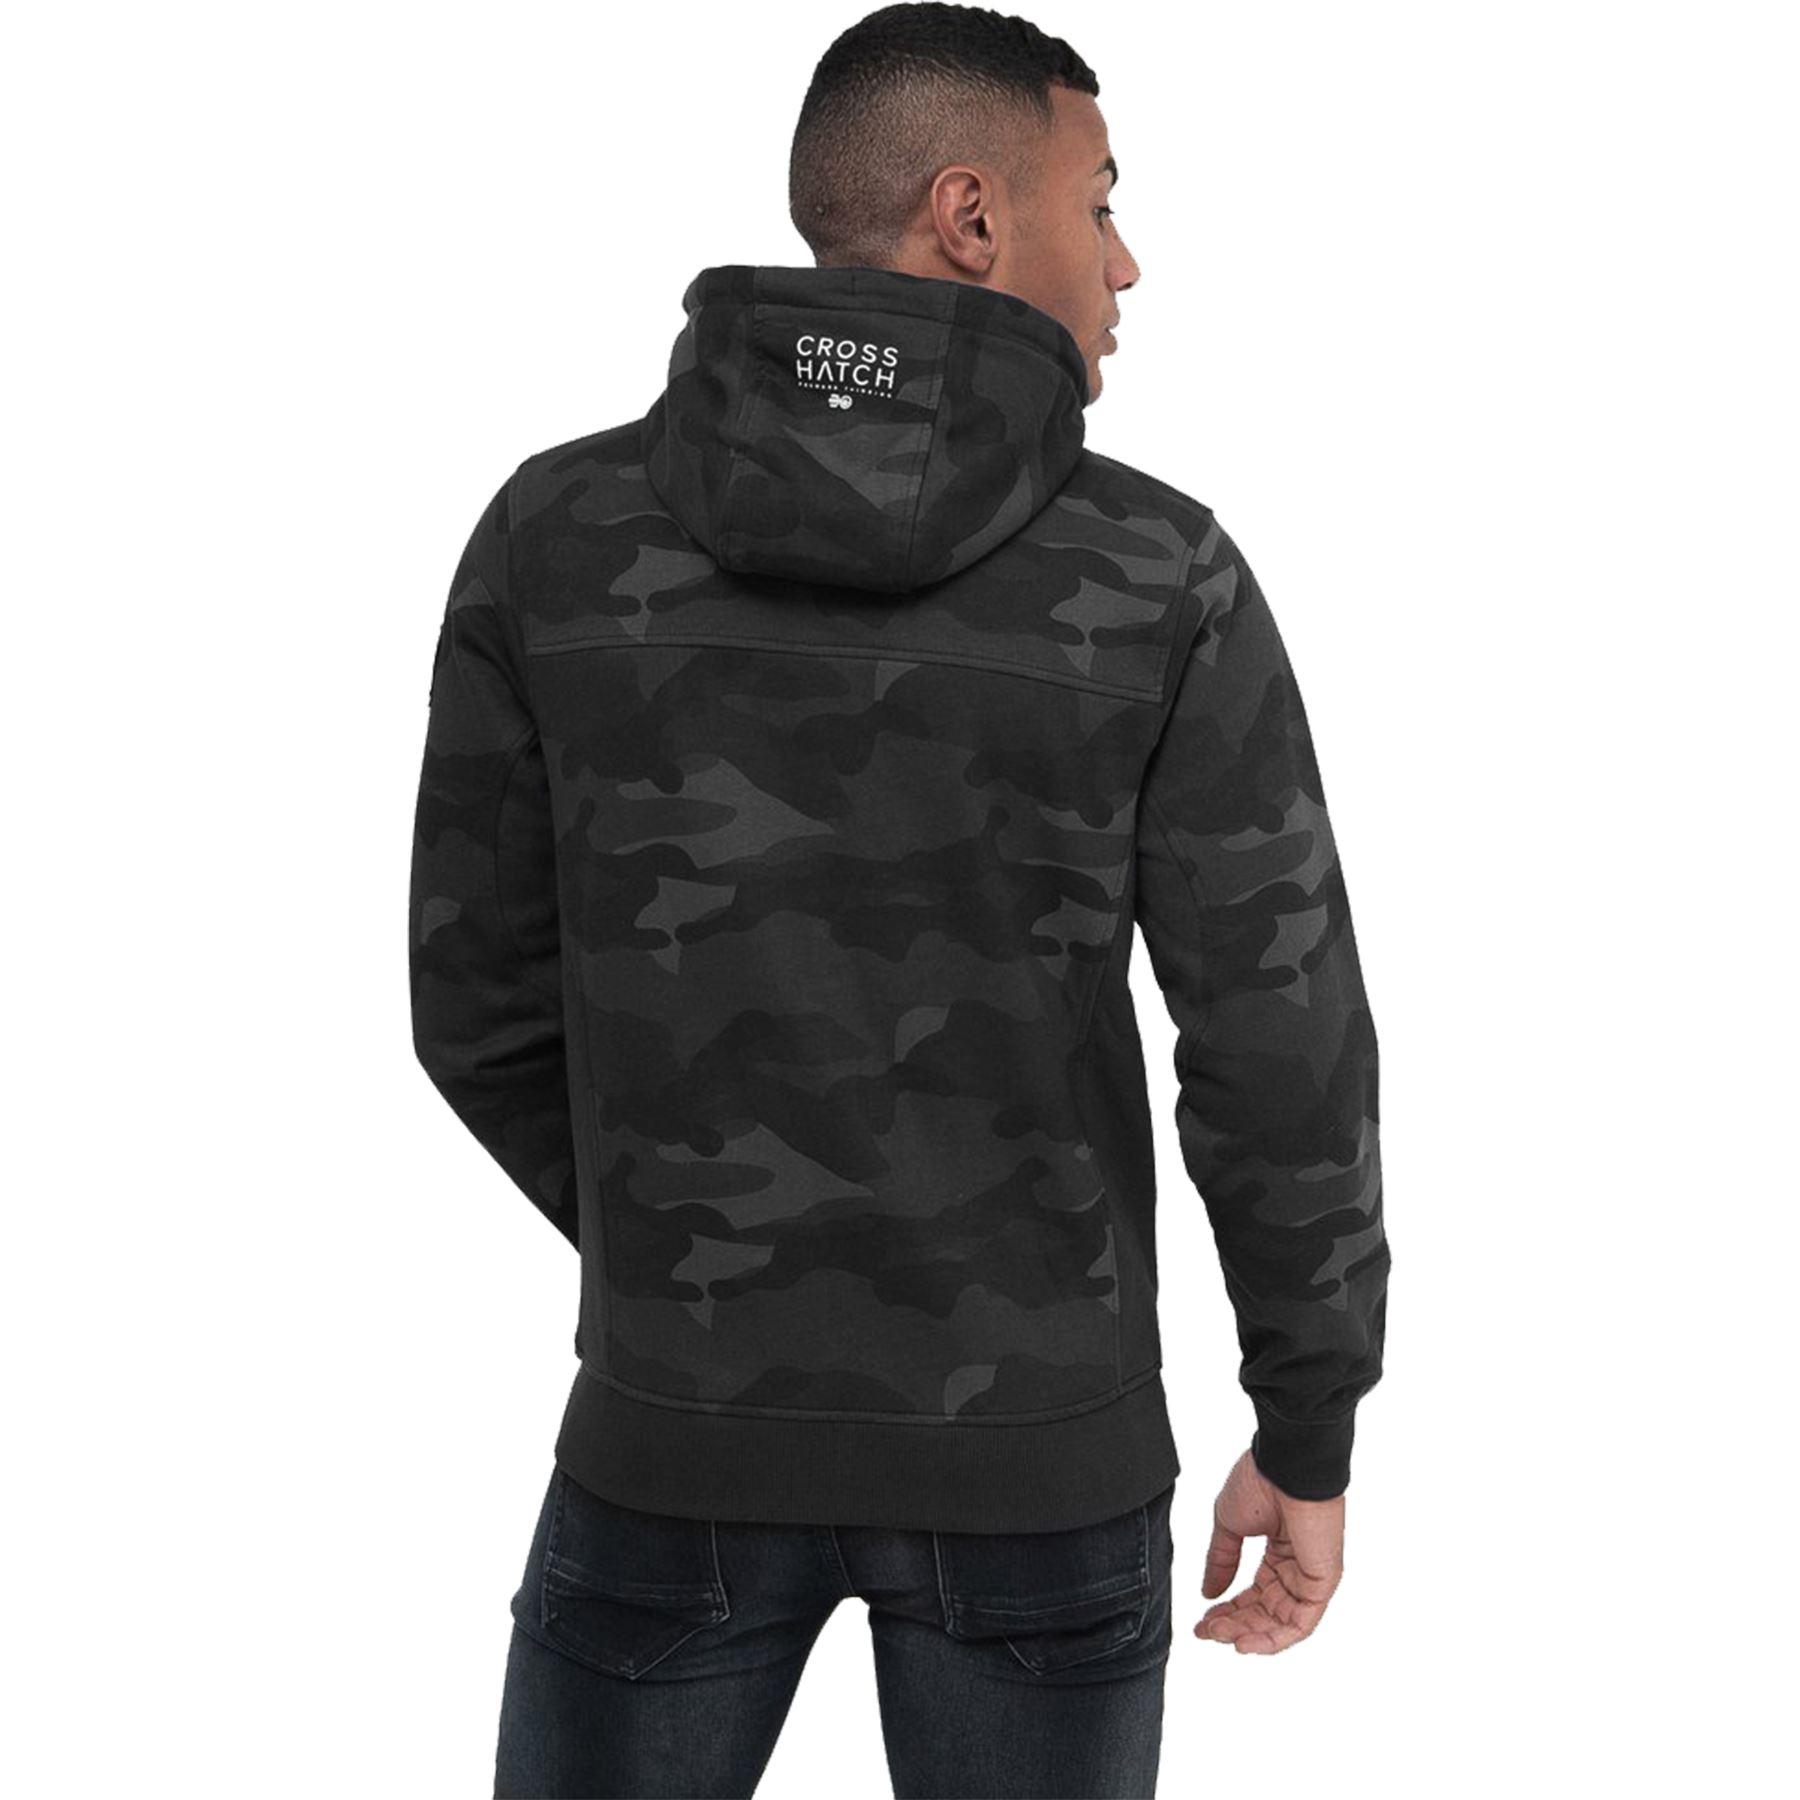 Crosshatch-Mens-Camo-Hoodie-Designer-Army-Style-Jacket-Zip-Thru-Pocket-Jacket thumbnail 9